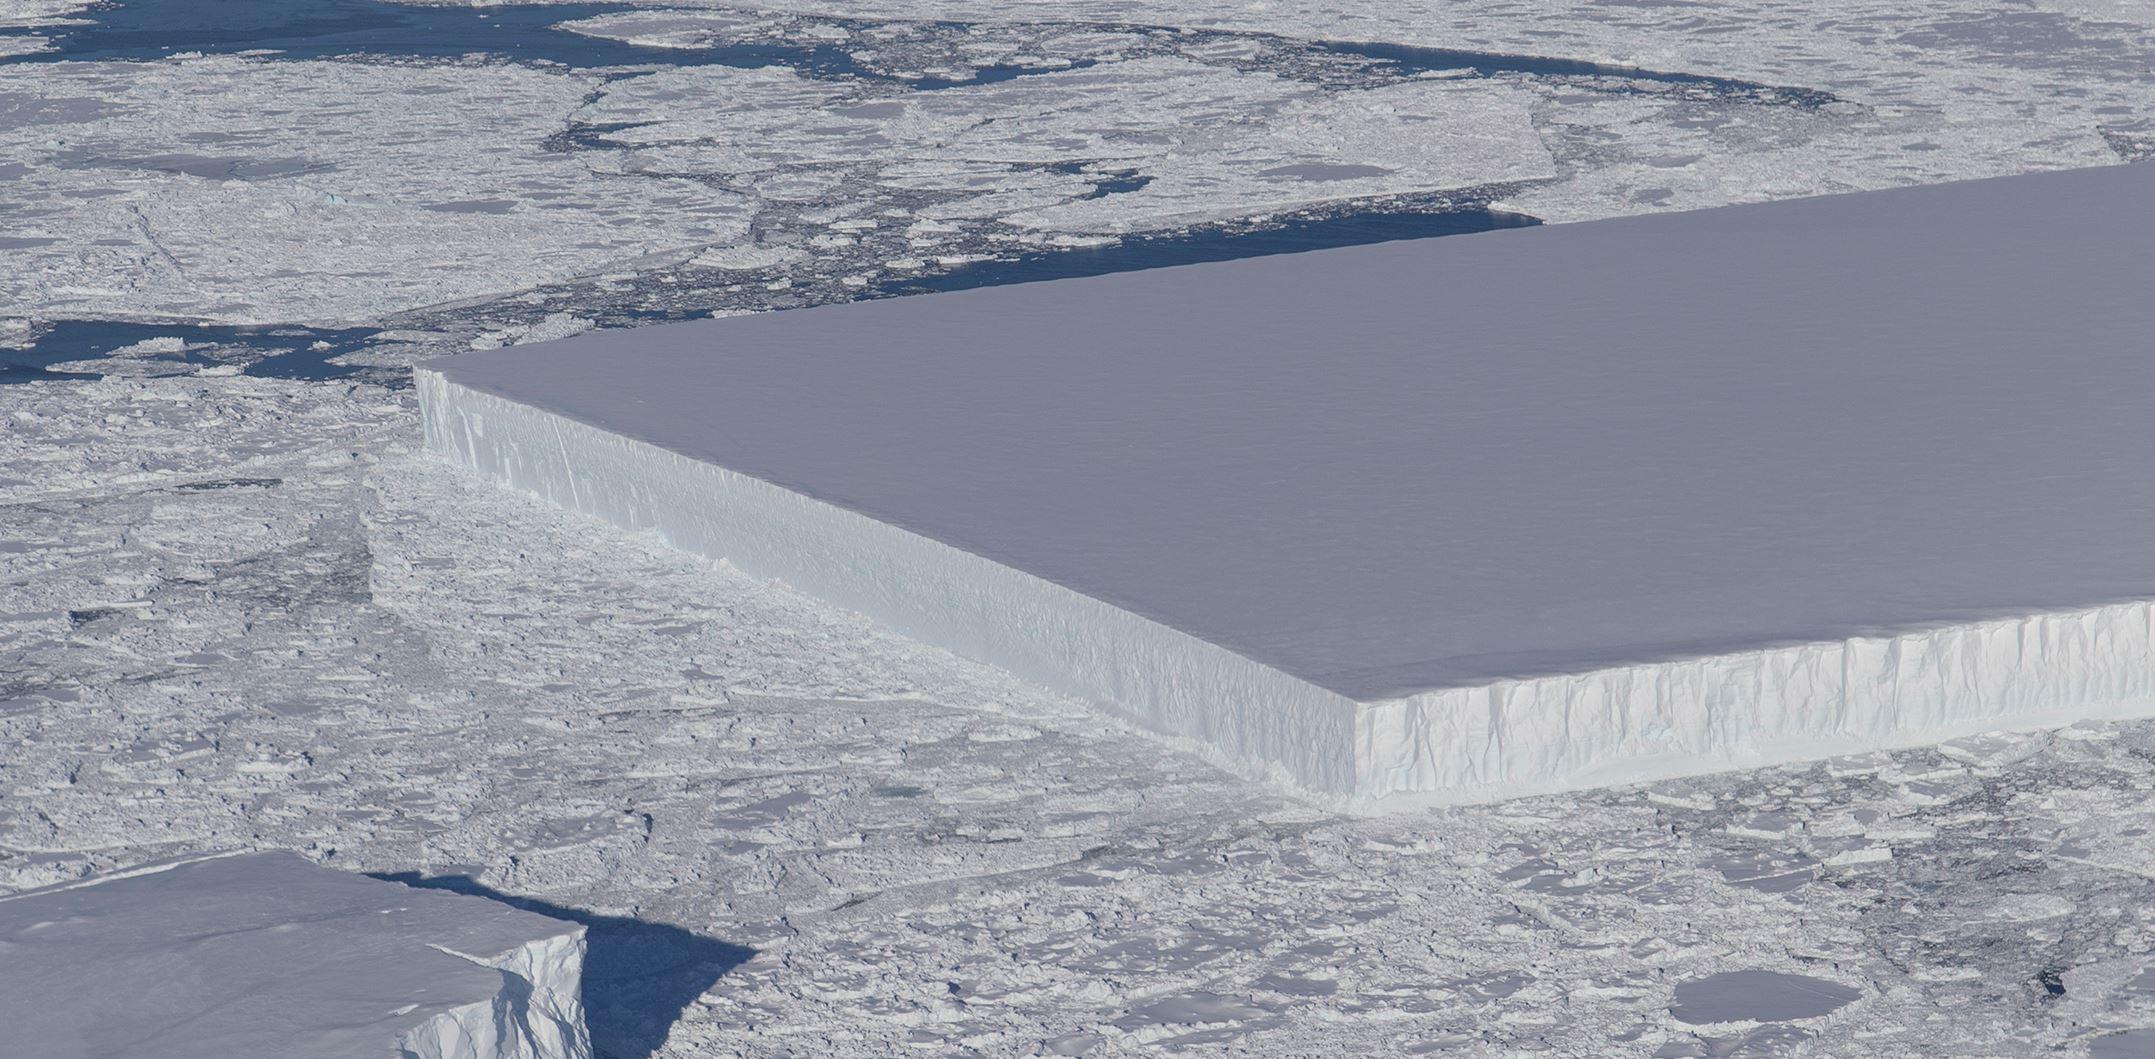 Icebergs of this shape are call 'tabular'. - Image Credit: NASA/Jeremy Hardbeck